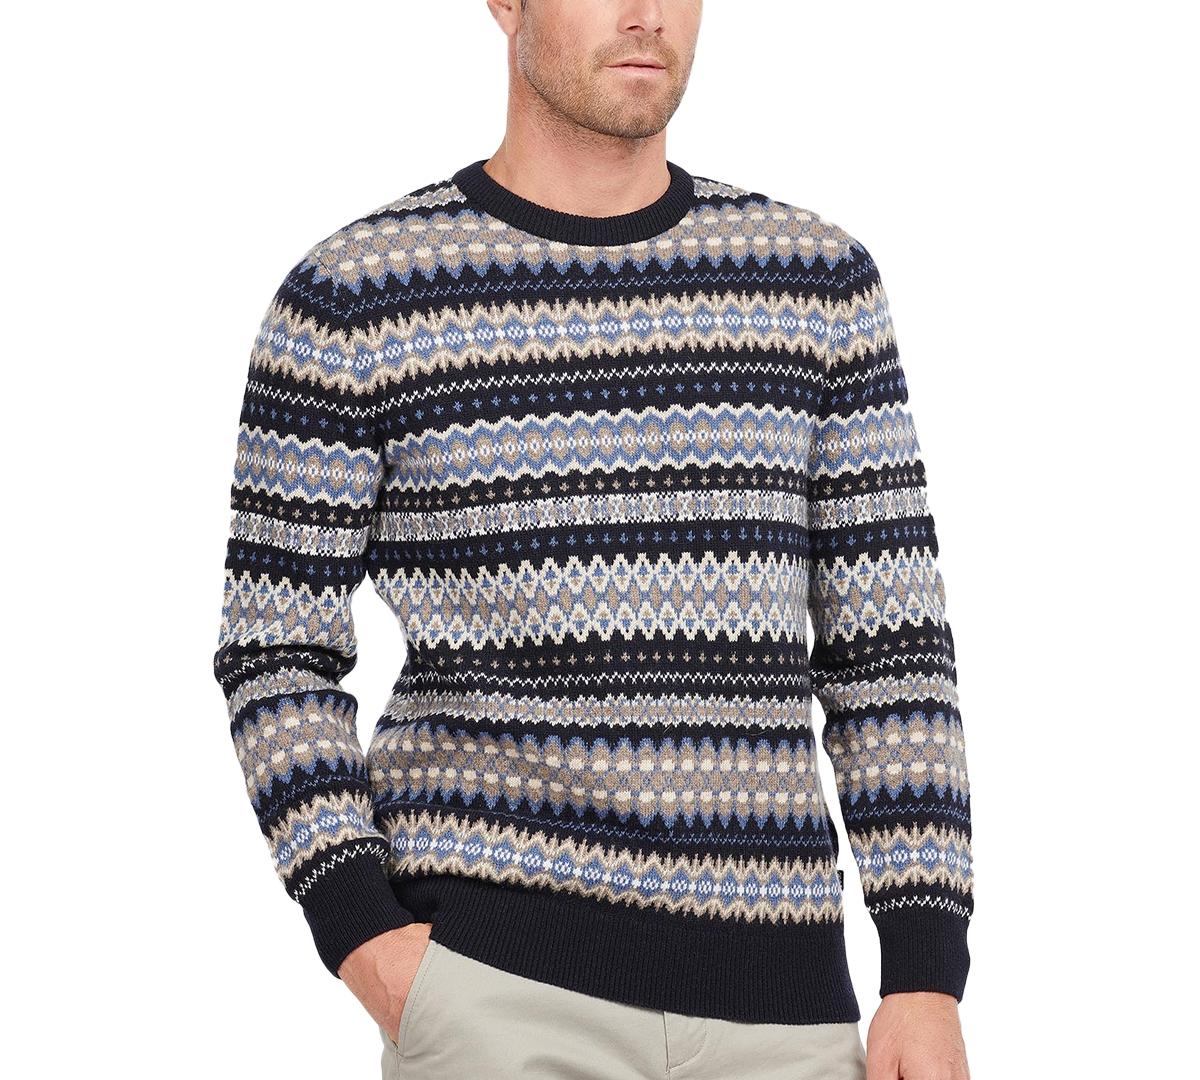 1920s Men's Style Clothing Barbour Mens Fair Isle Sweater $125.00 AT vintagedancer.com